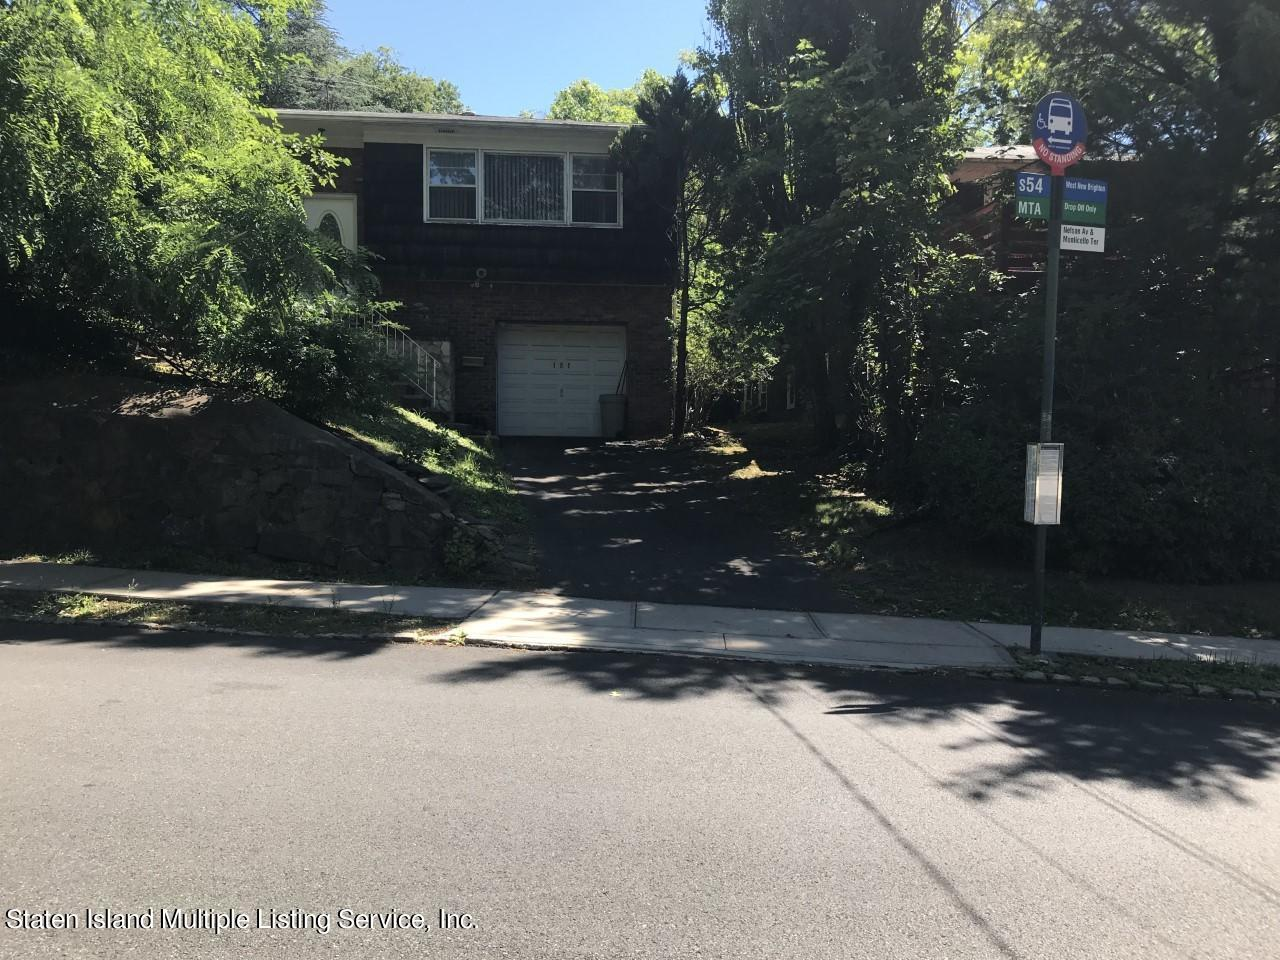 Single Family - Detached 181 Nelson Avenue  Staten Island, NY 10308, MLS-1147311-5